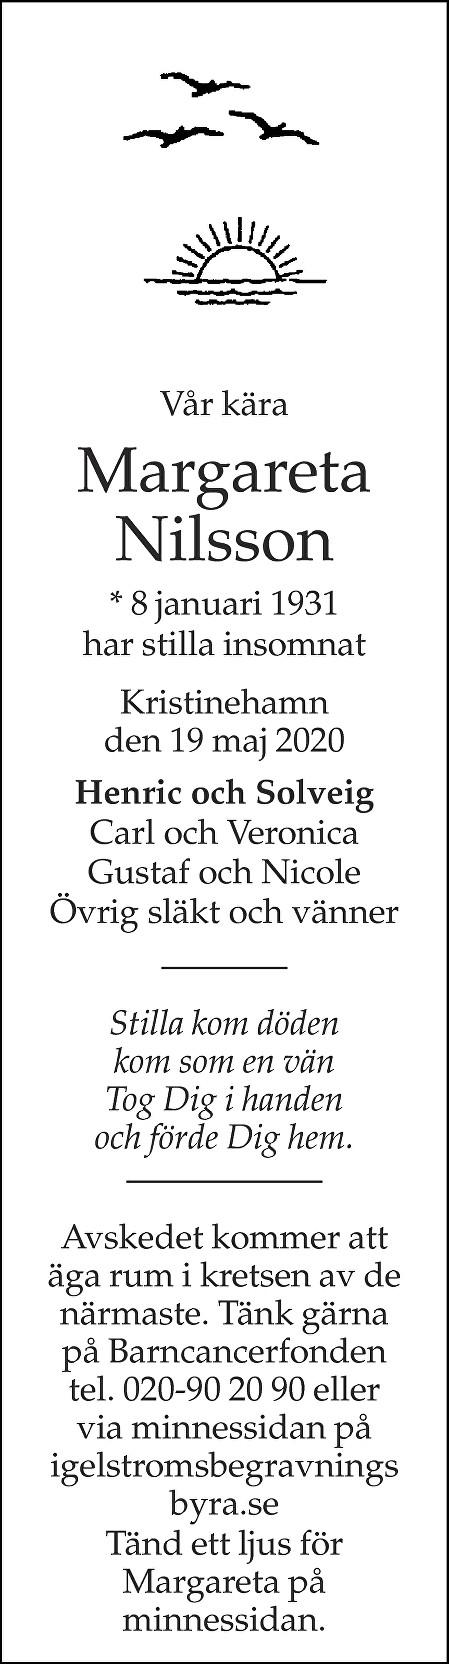 Margareta Nilsson Death notice